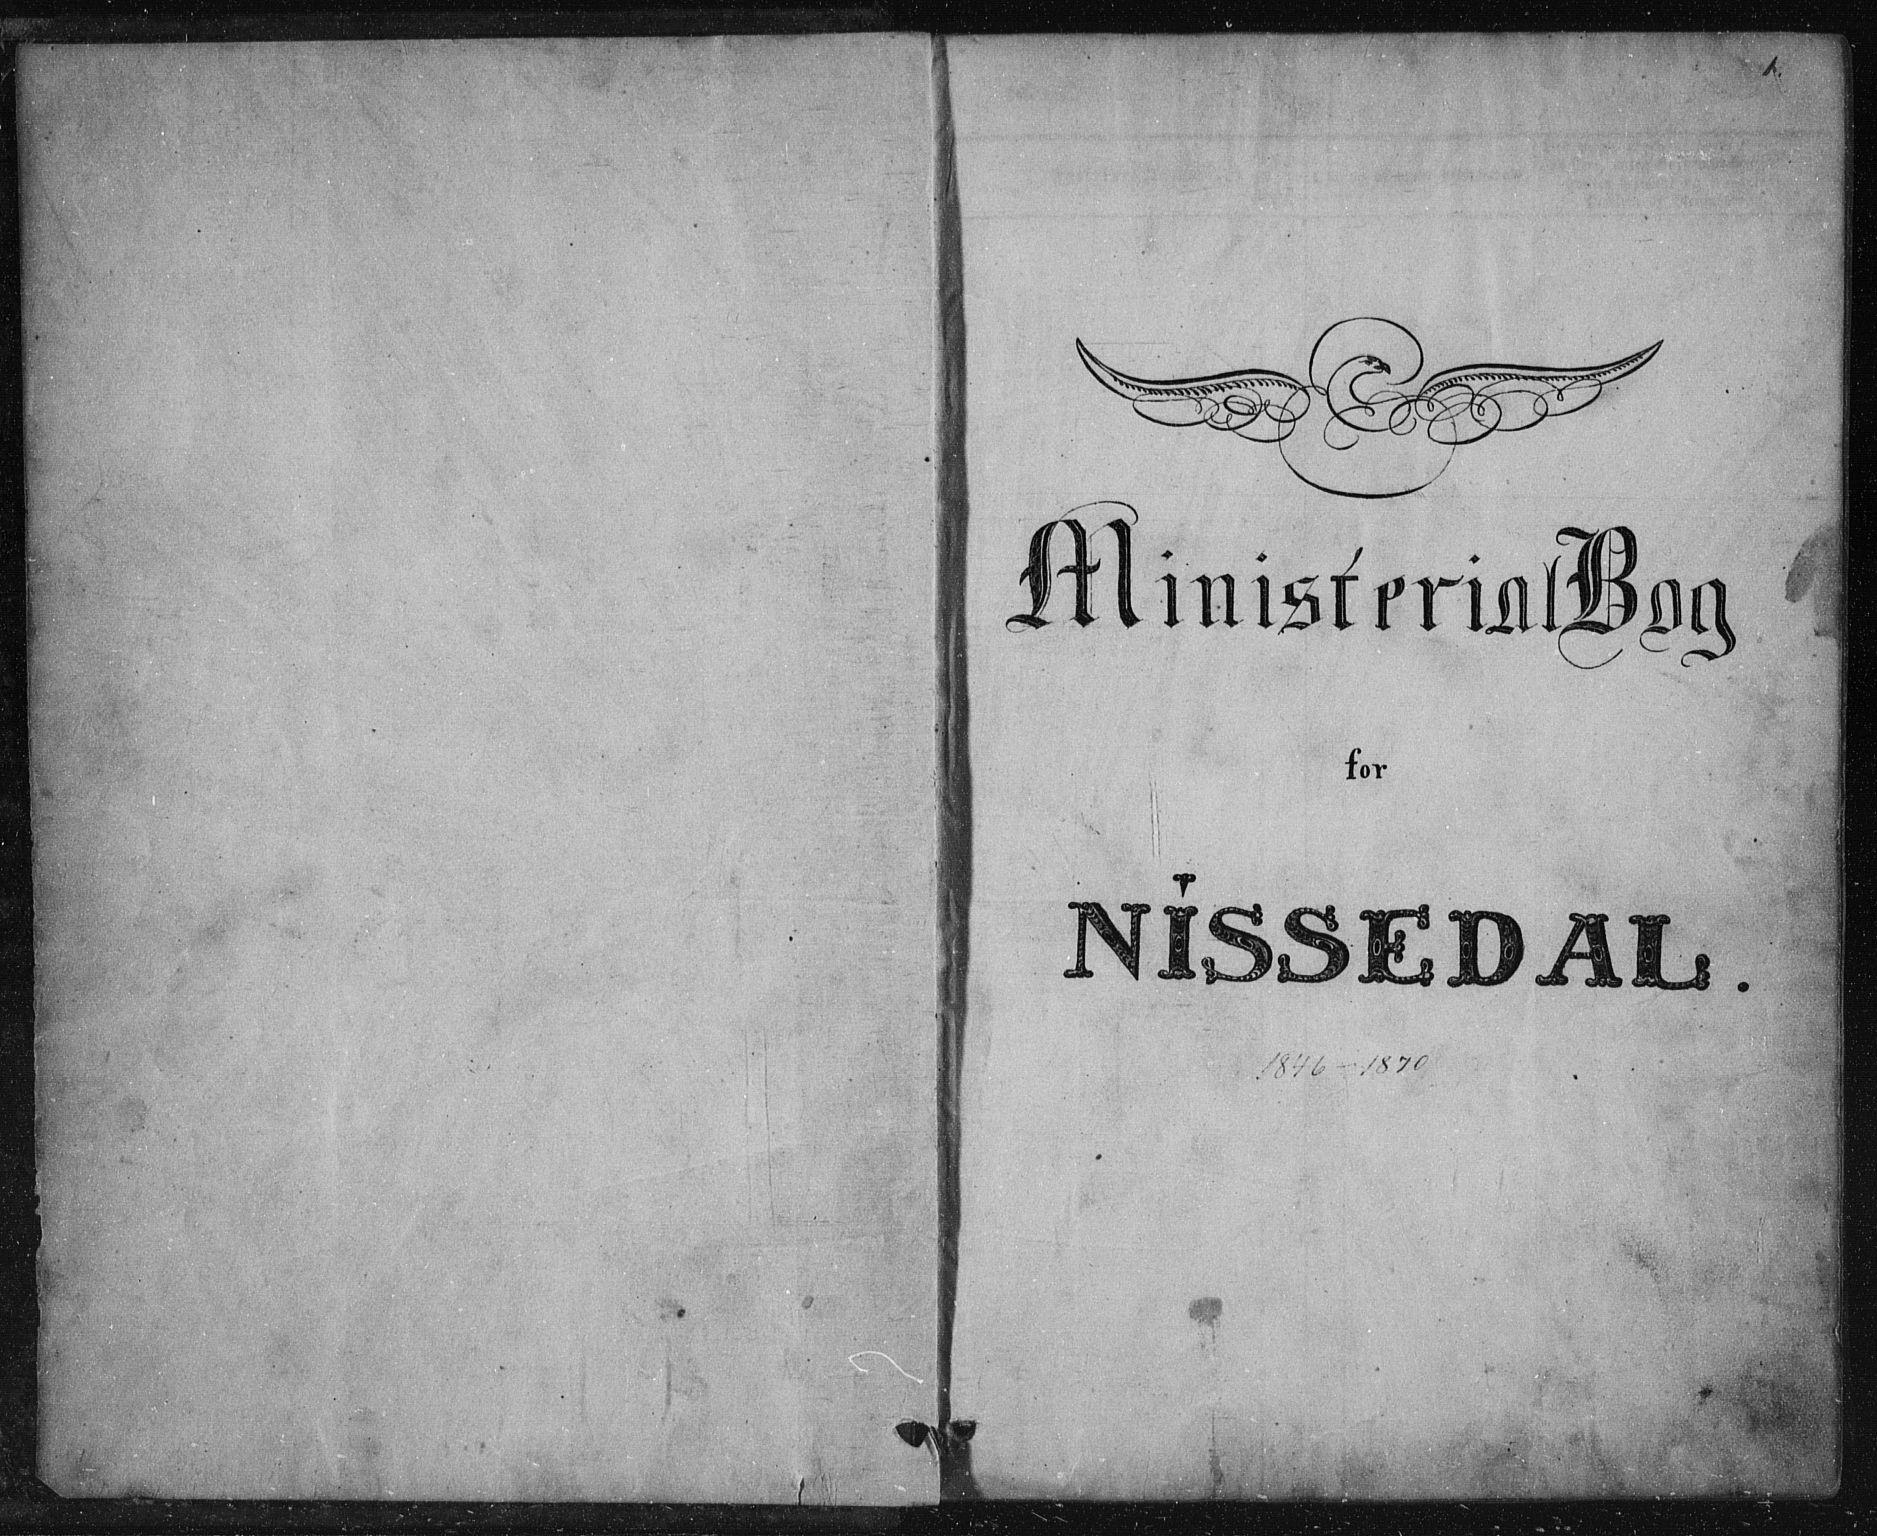 SAKO, Nissedal kirkebøker, F/Fa/L0003: Ministerialbok nr. I 3, 1846-1870, s. 0-1